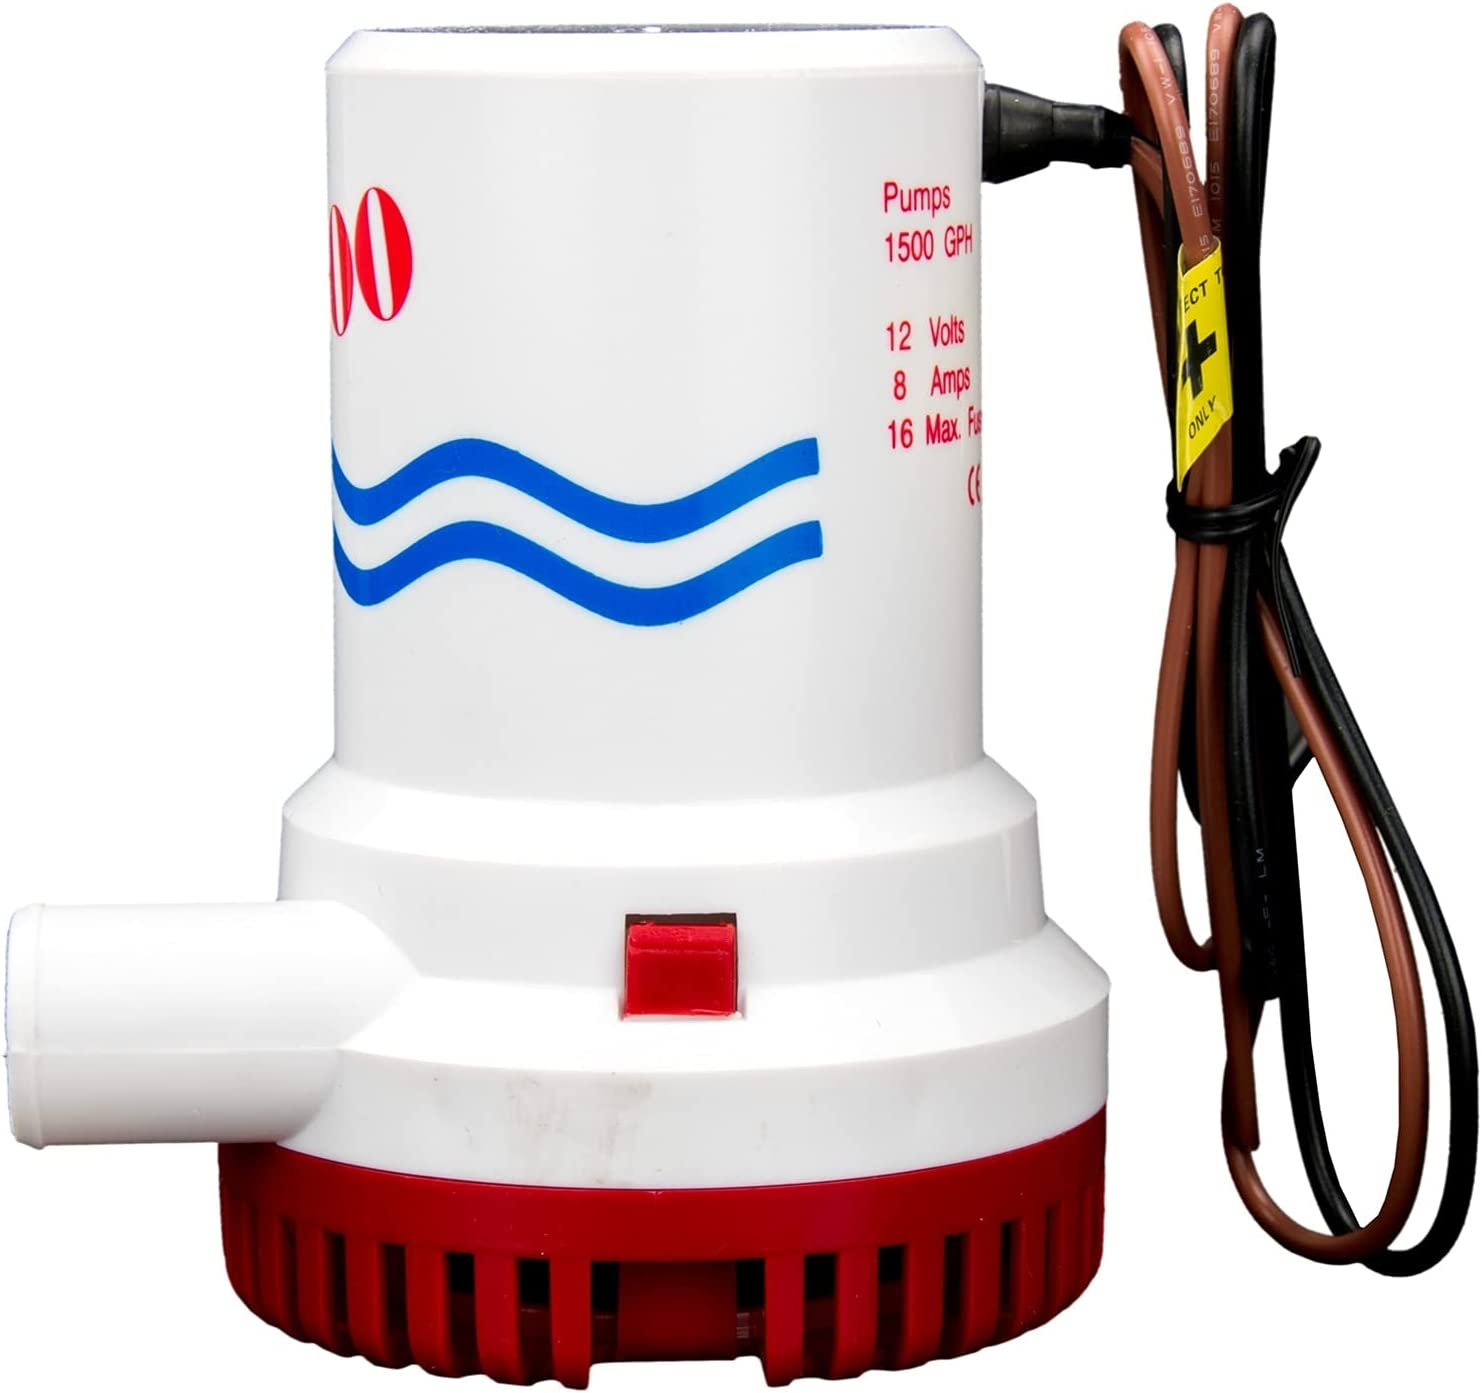 Yi-Achieve Boat Bilge Pump Marine Water Submersible Max 72% OFFicial shop OFF DC Pum Yacht